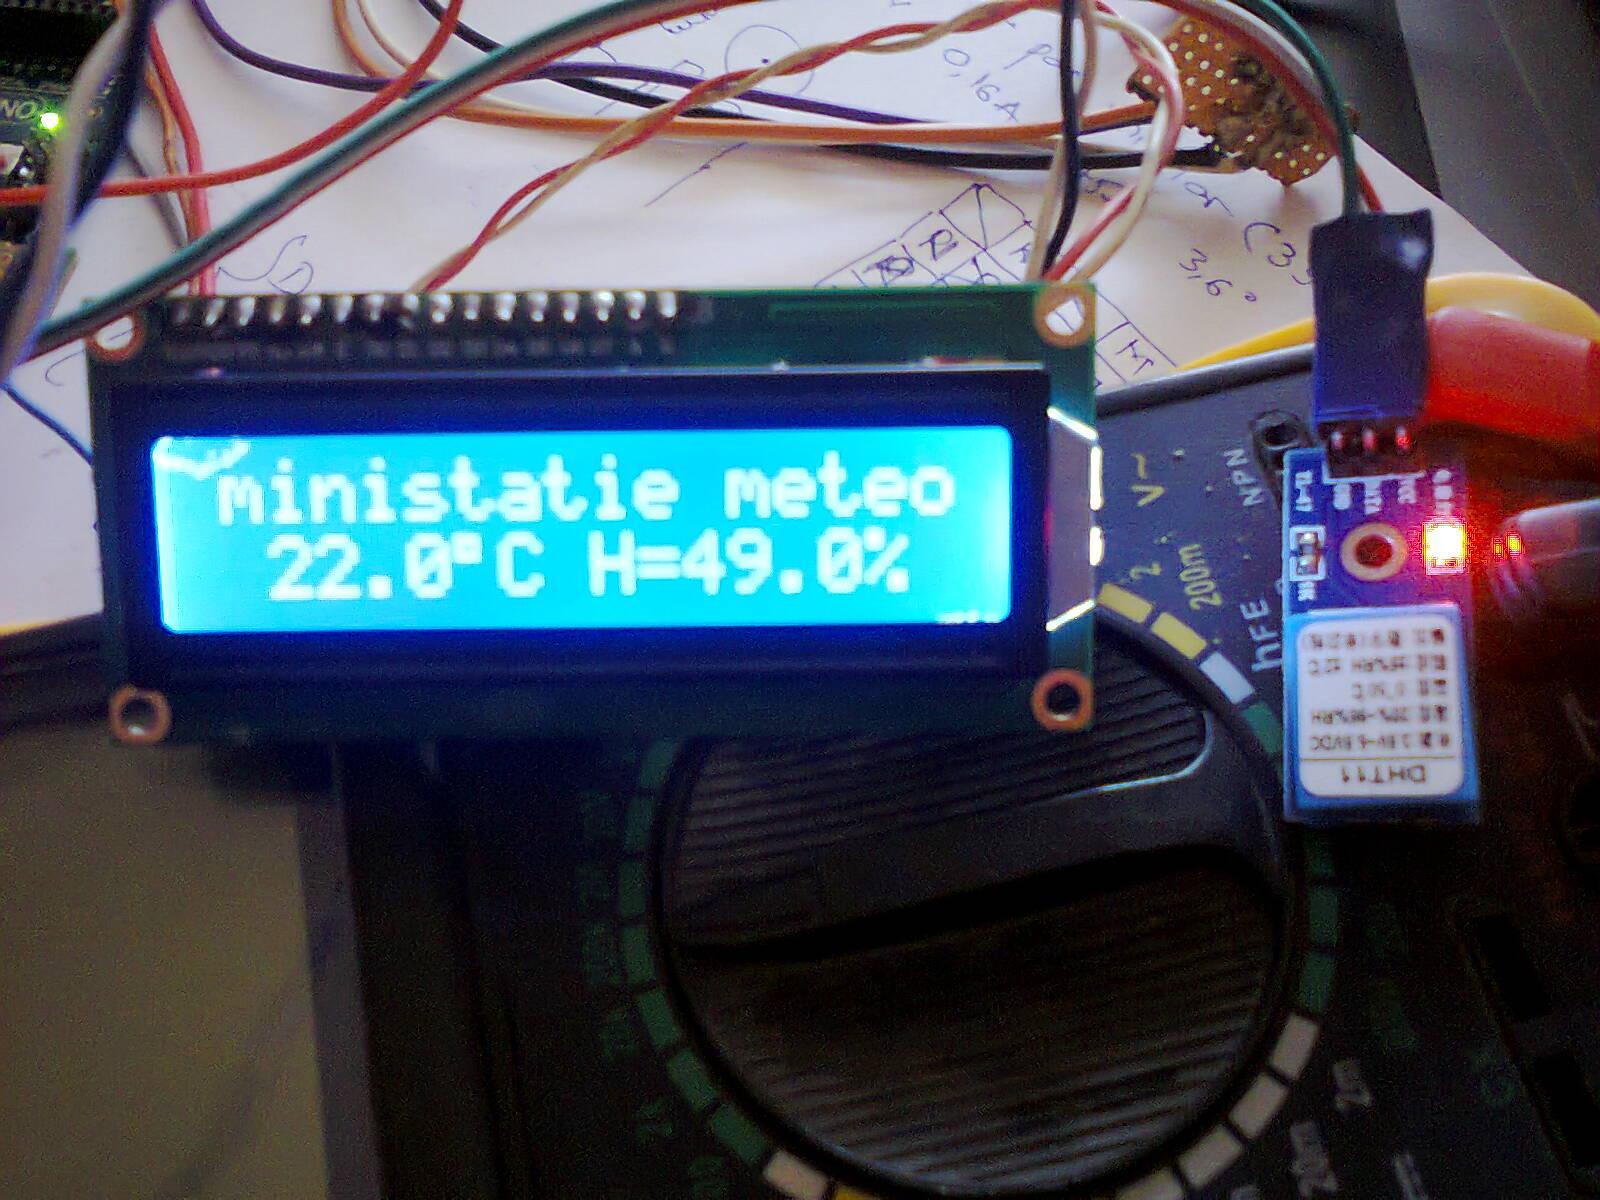 Ministatie meteo cu senzorul dht si arduino electrodb ro